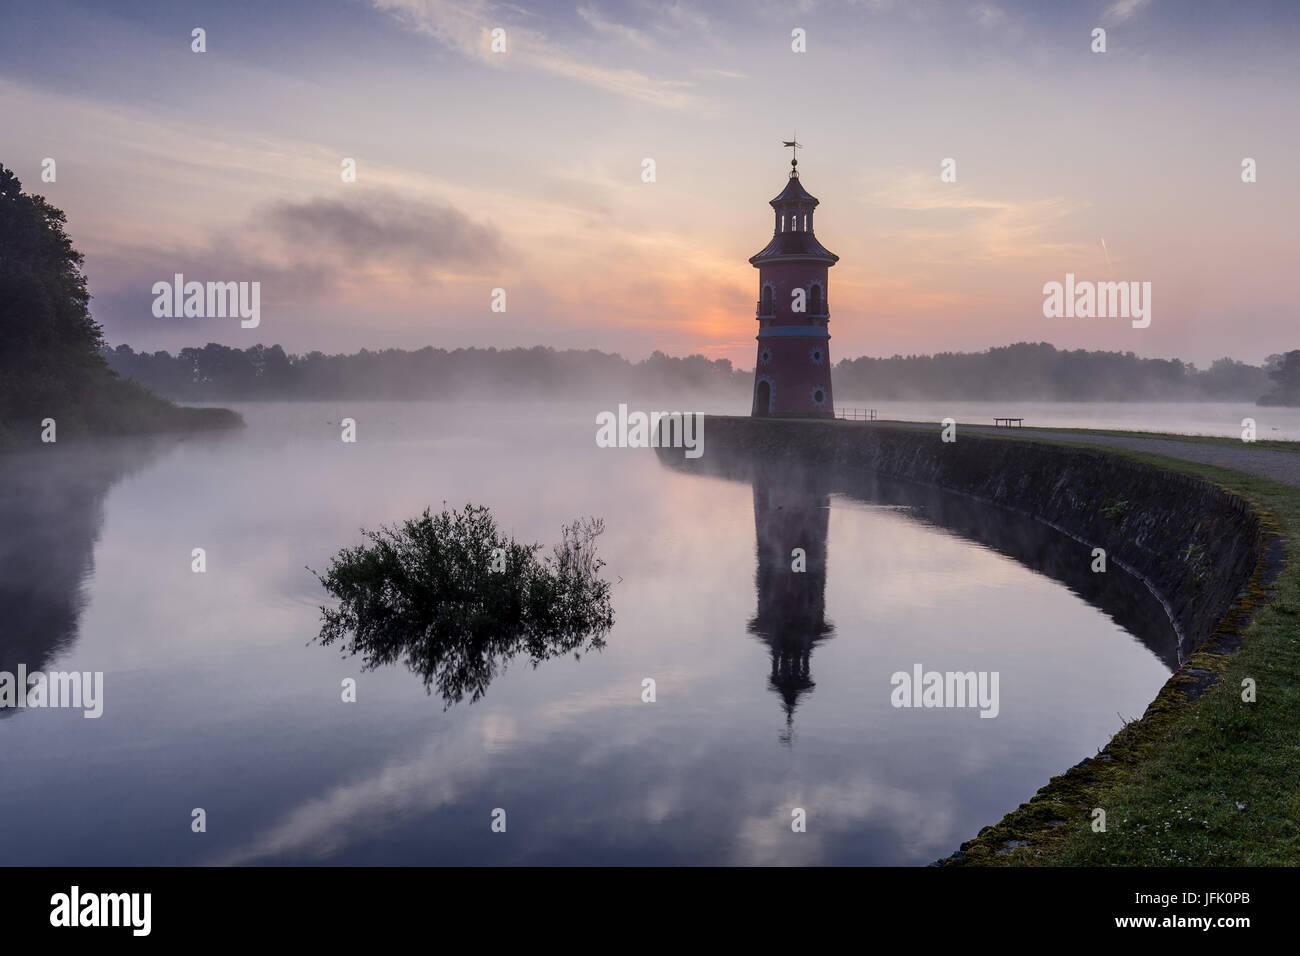 Moritzburg Lighthouse with jetty, saxony Stock Photo